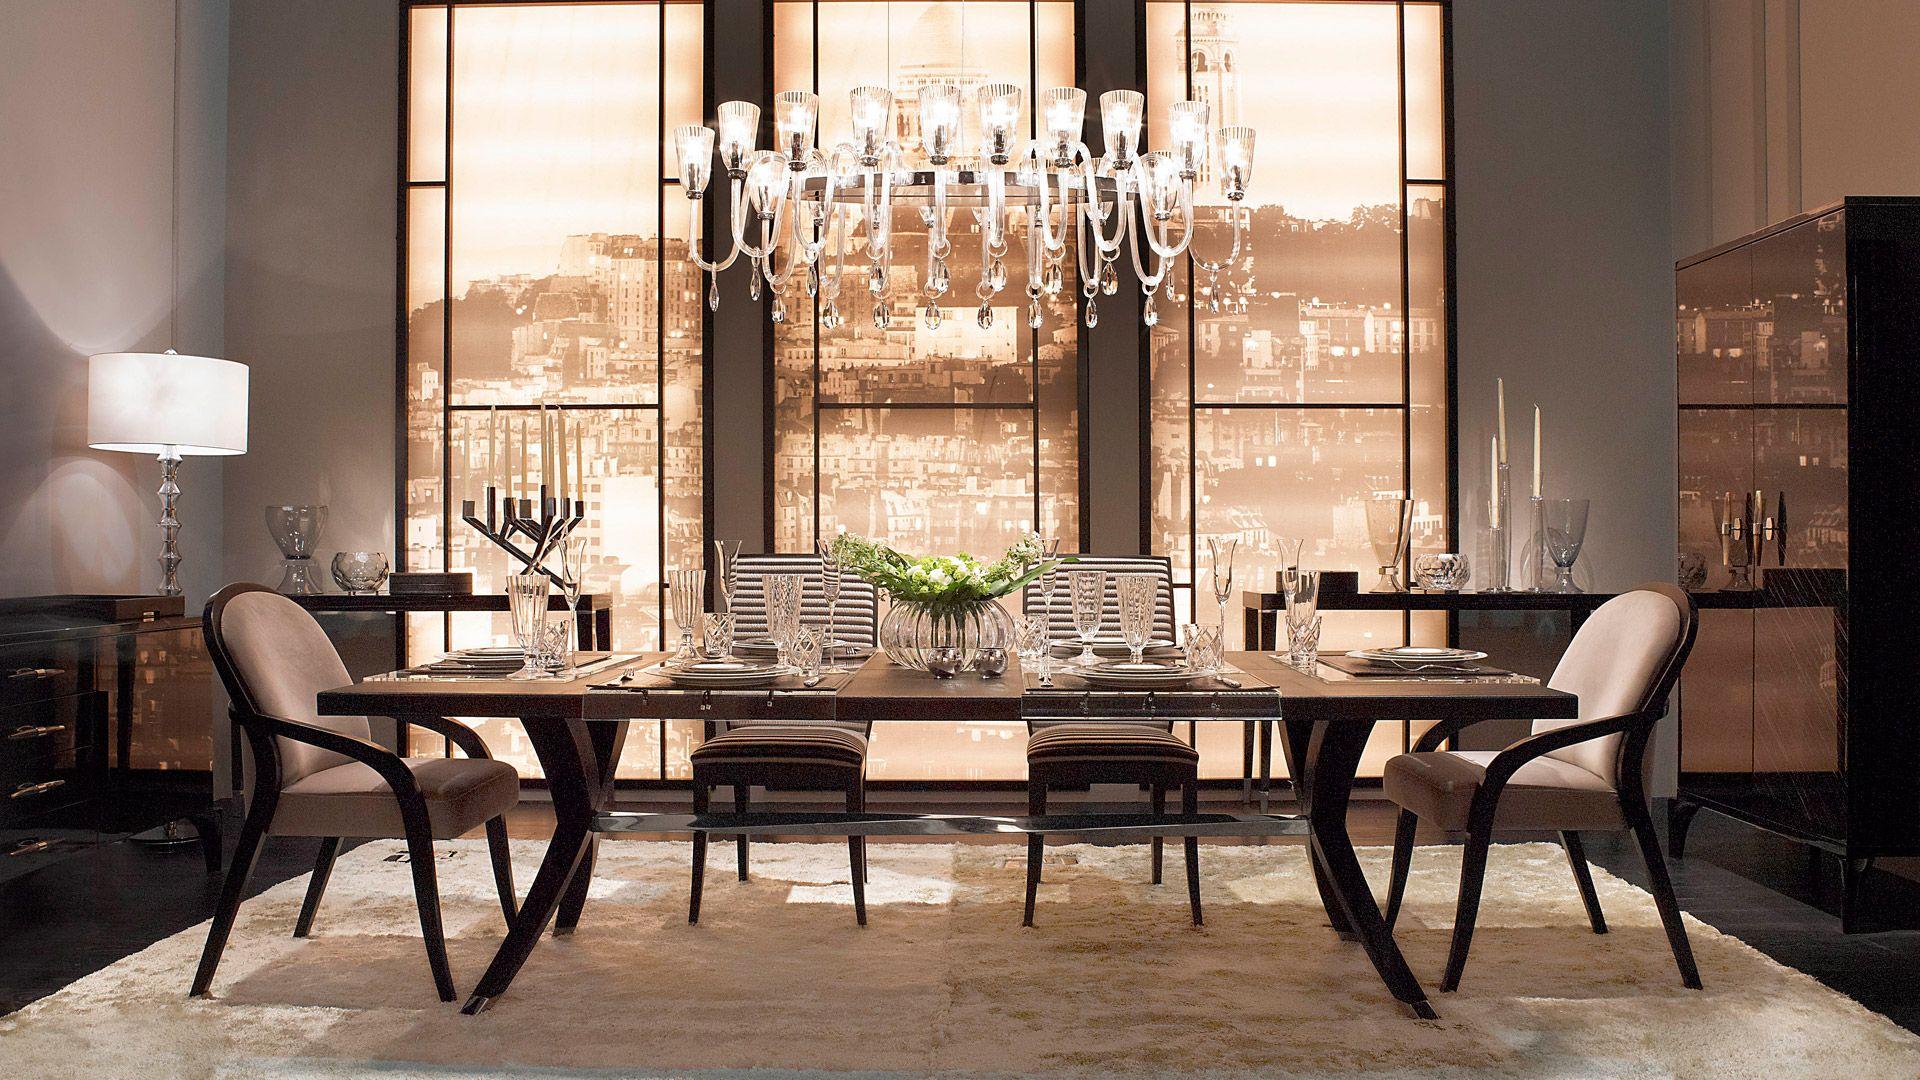 Mobili fendi ~ Beautiful dining rooms from fendicasa fendi diningroom